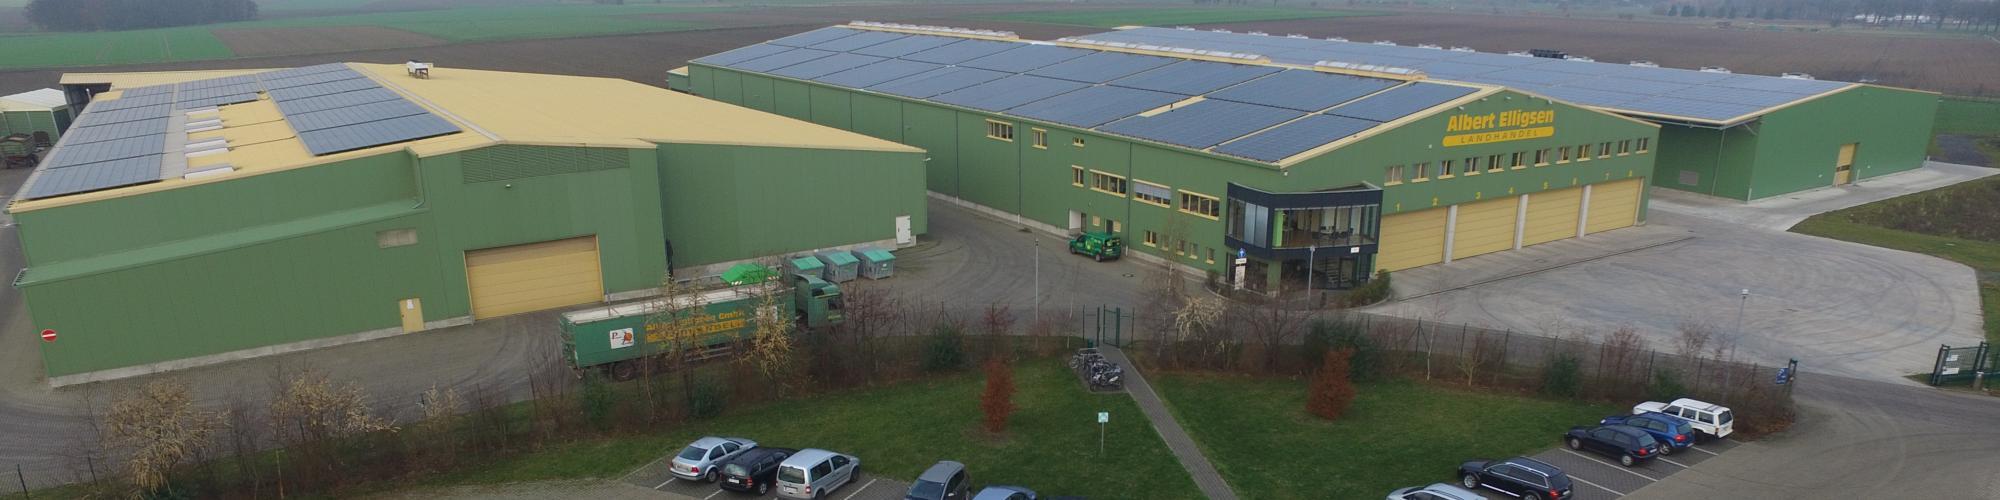 Albert Elligsen GmbH